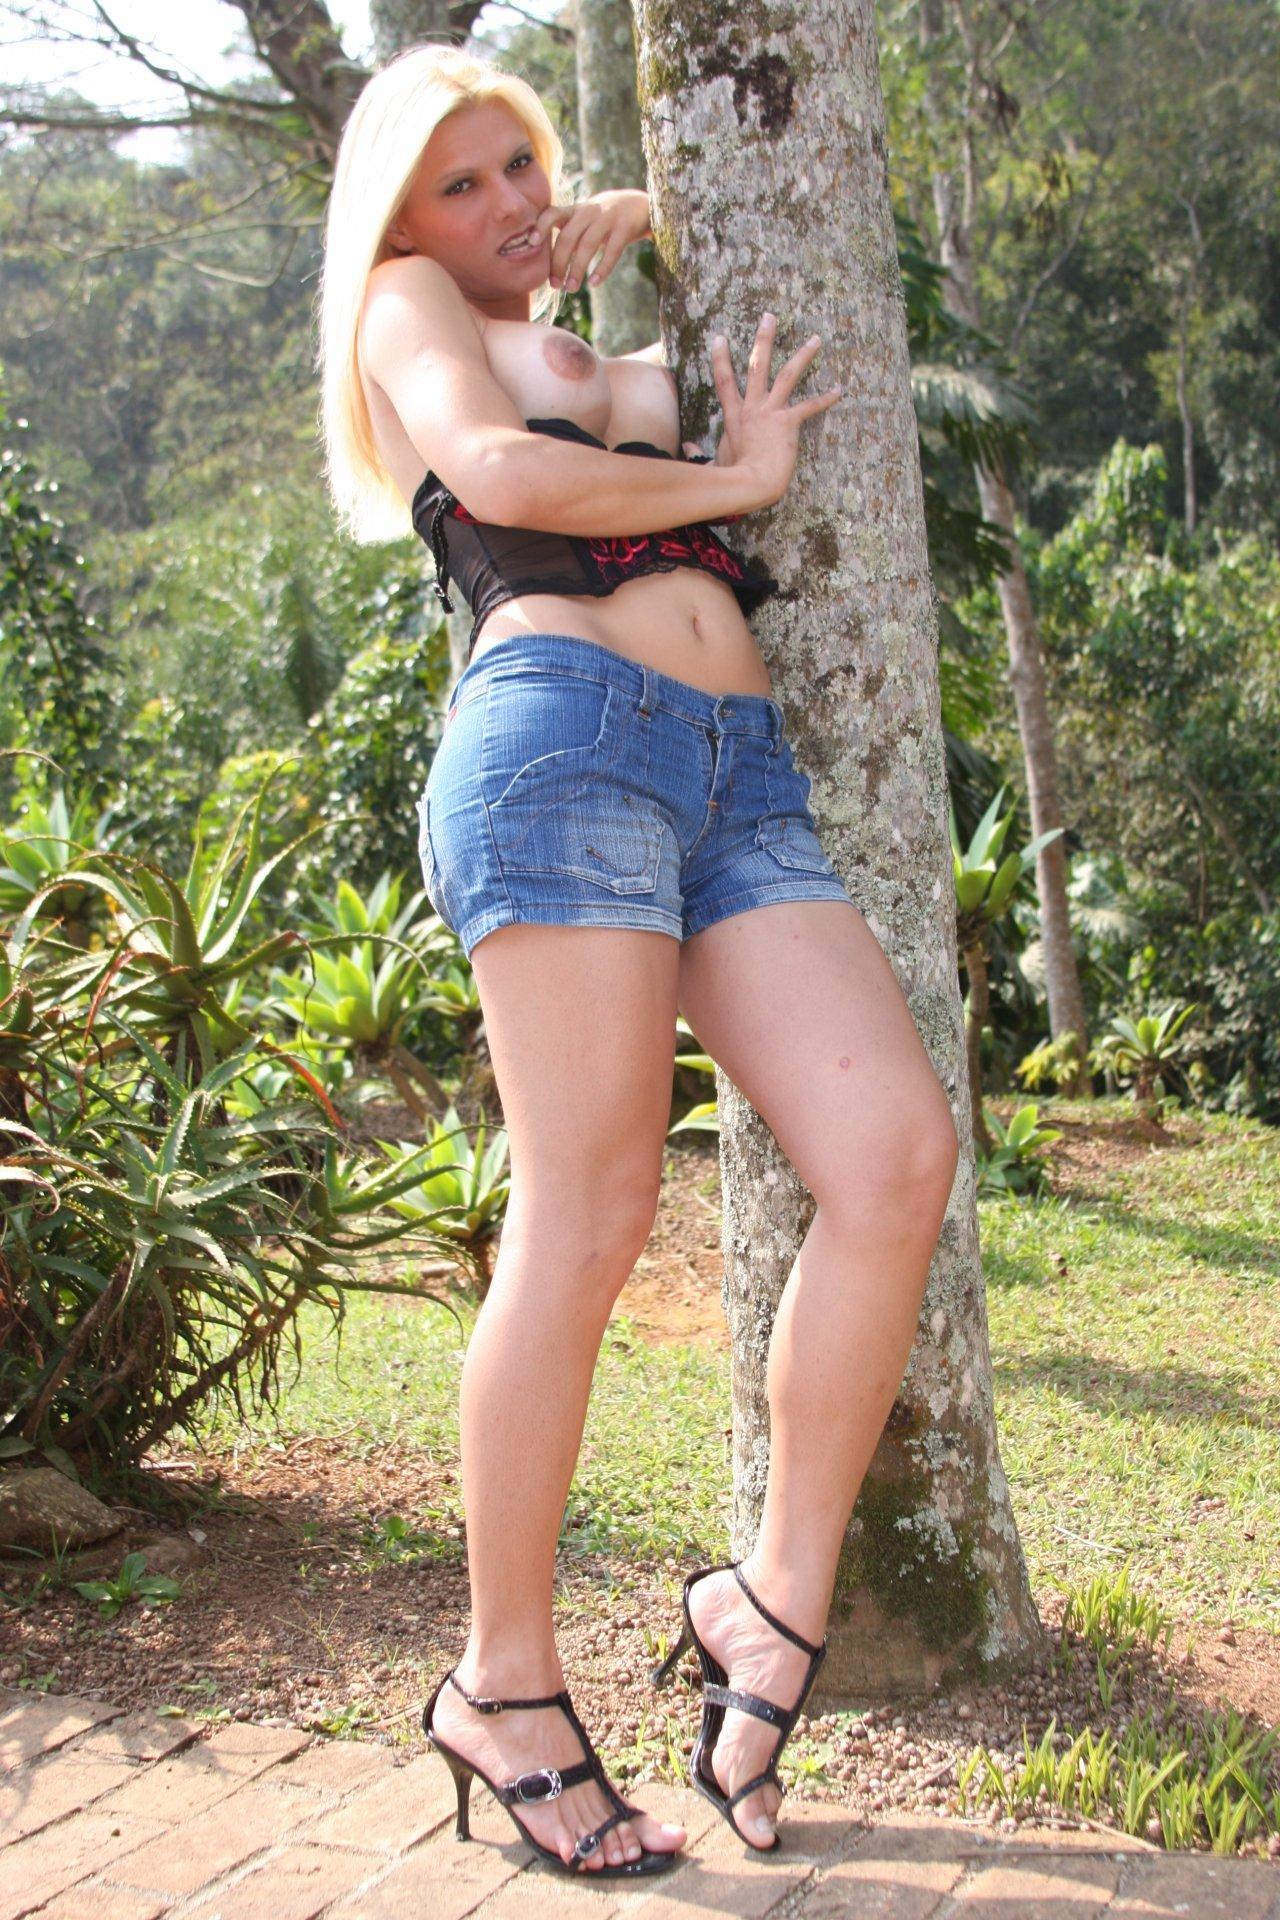 TickleM0nster from Queensland,Australia